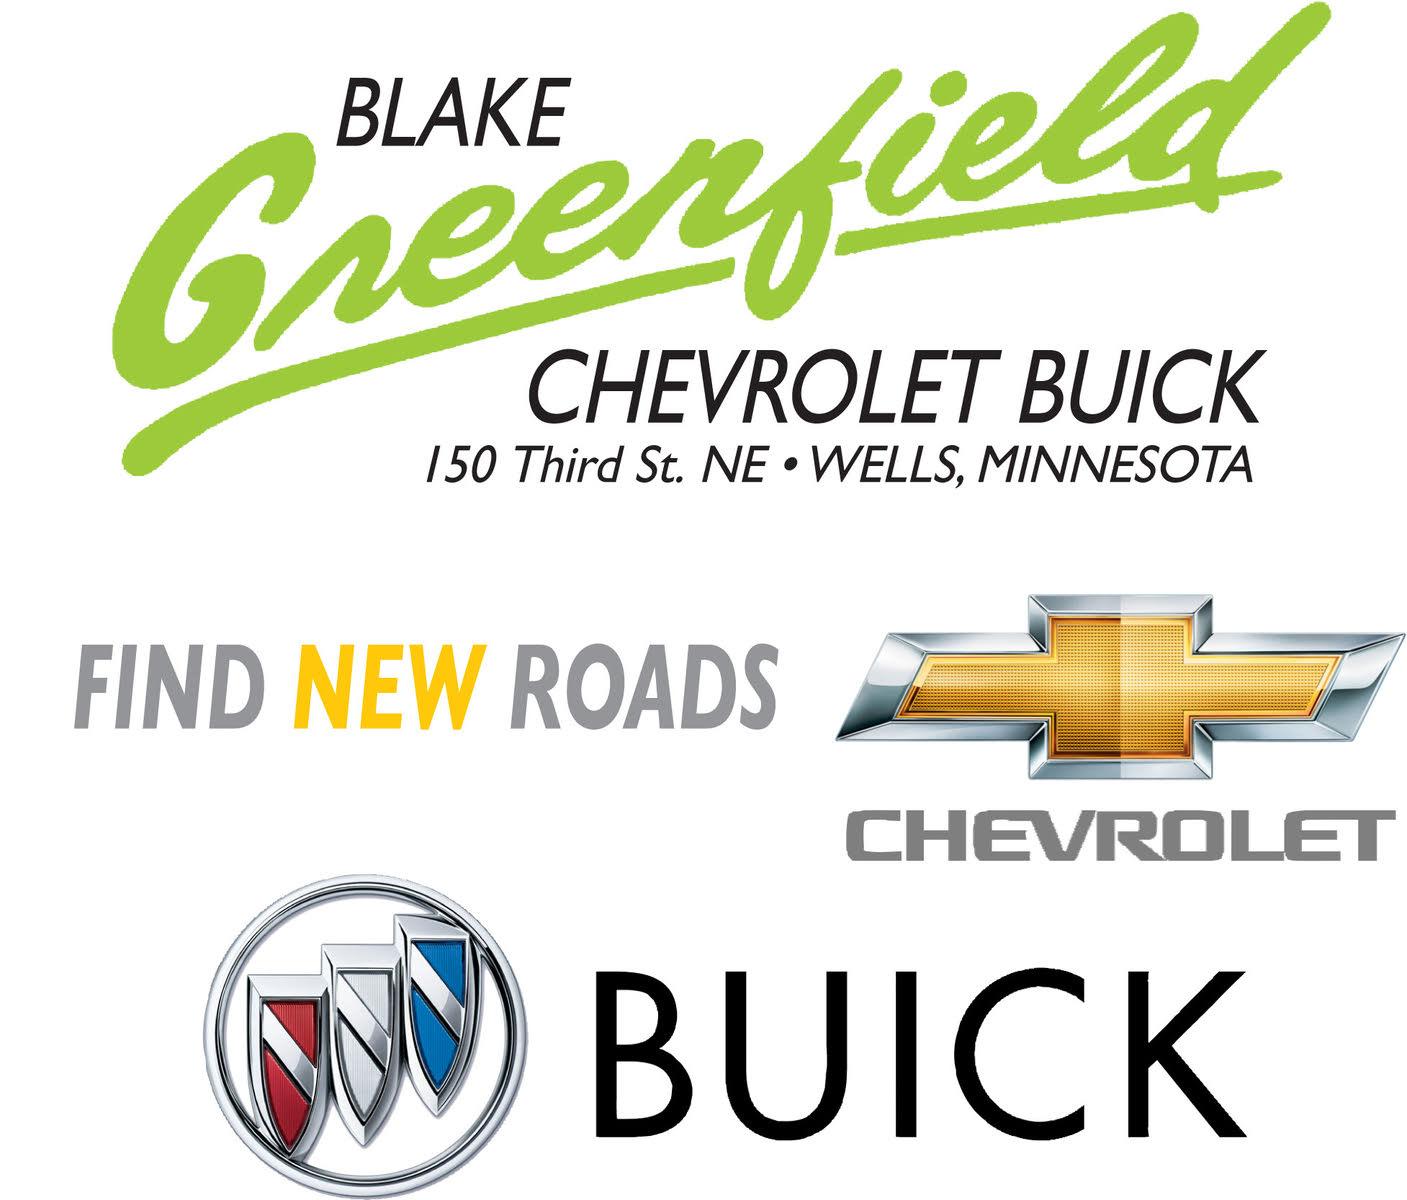 Buick Dealerships In Minnesota: Blake Greenfield Chevrolet Buick